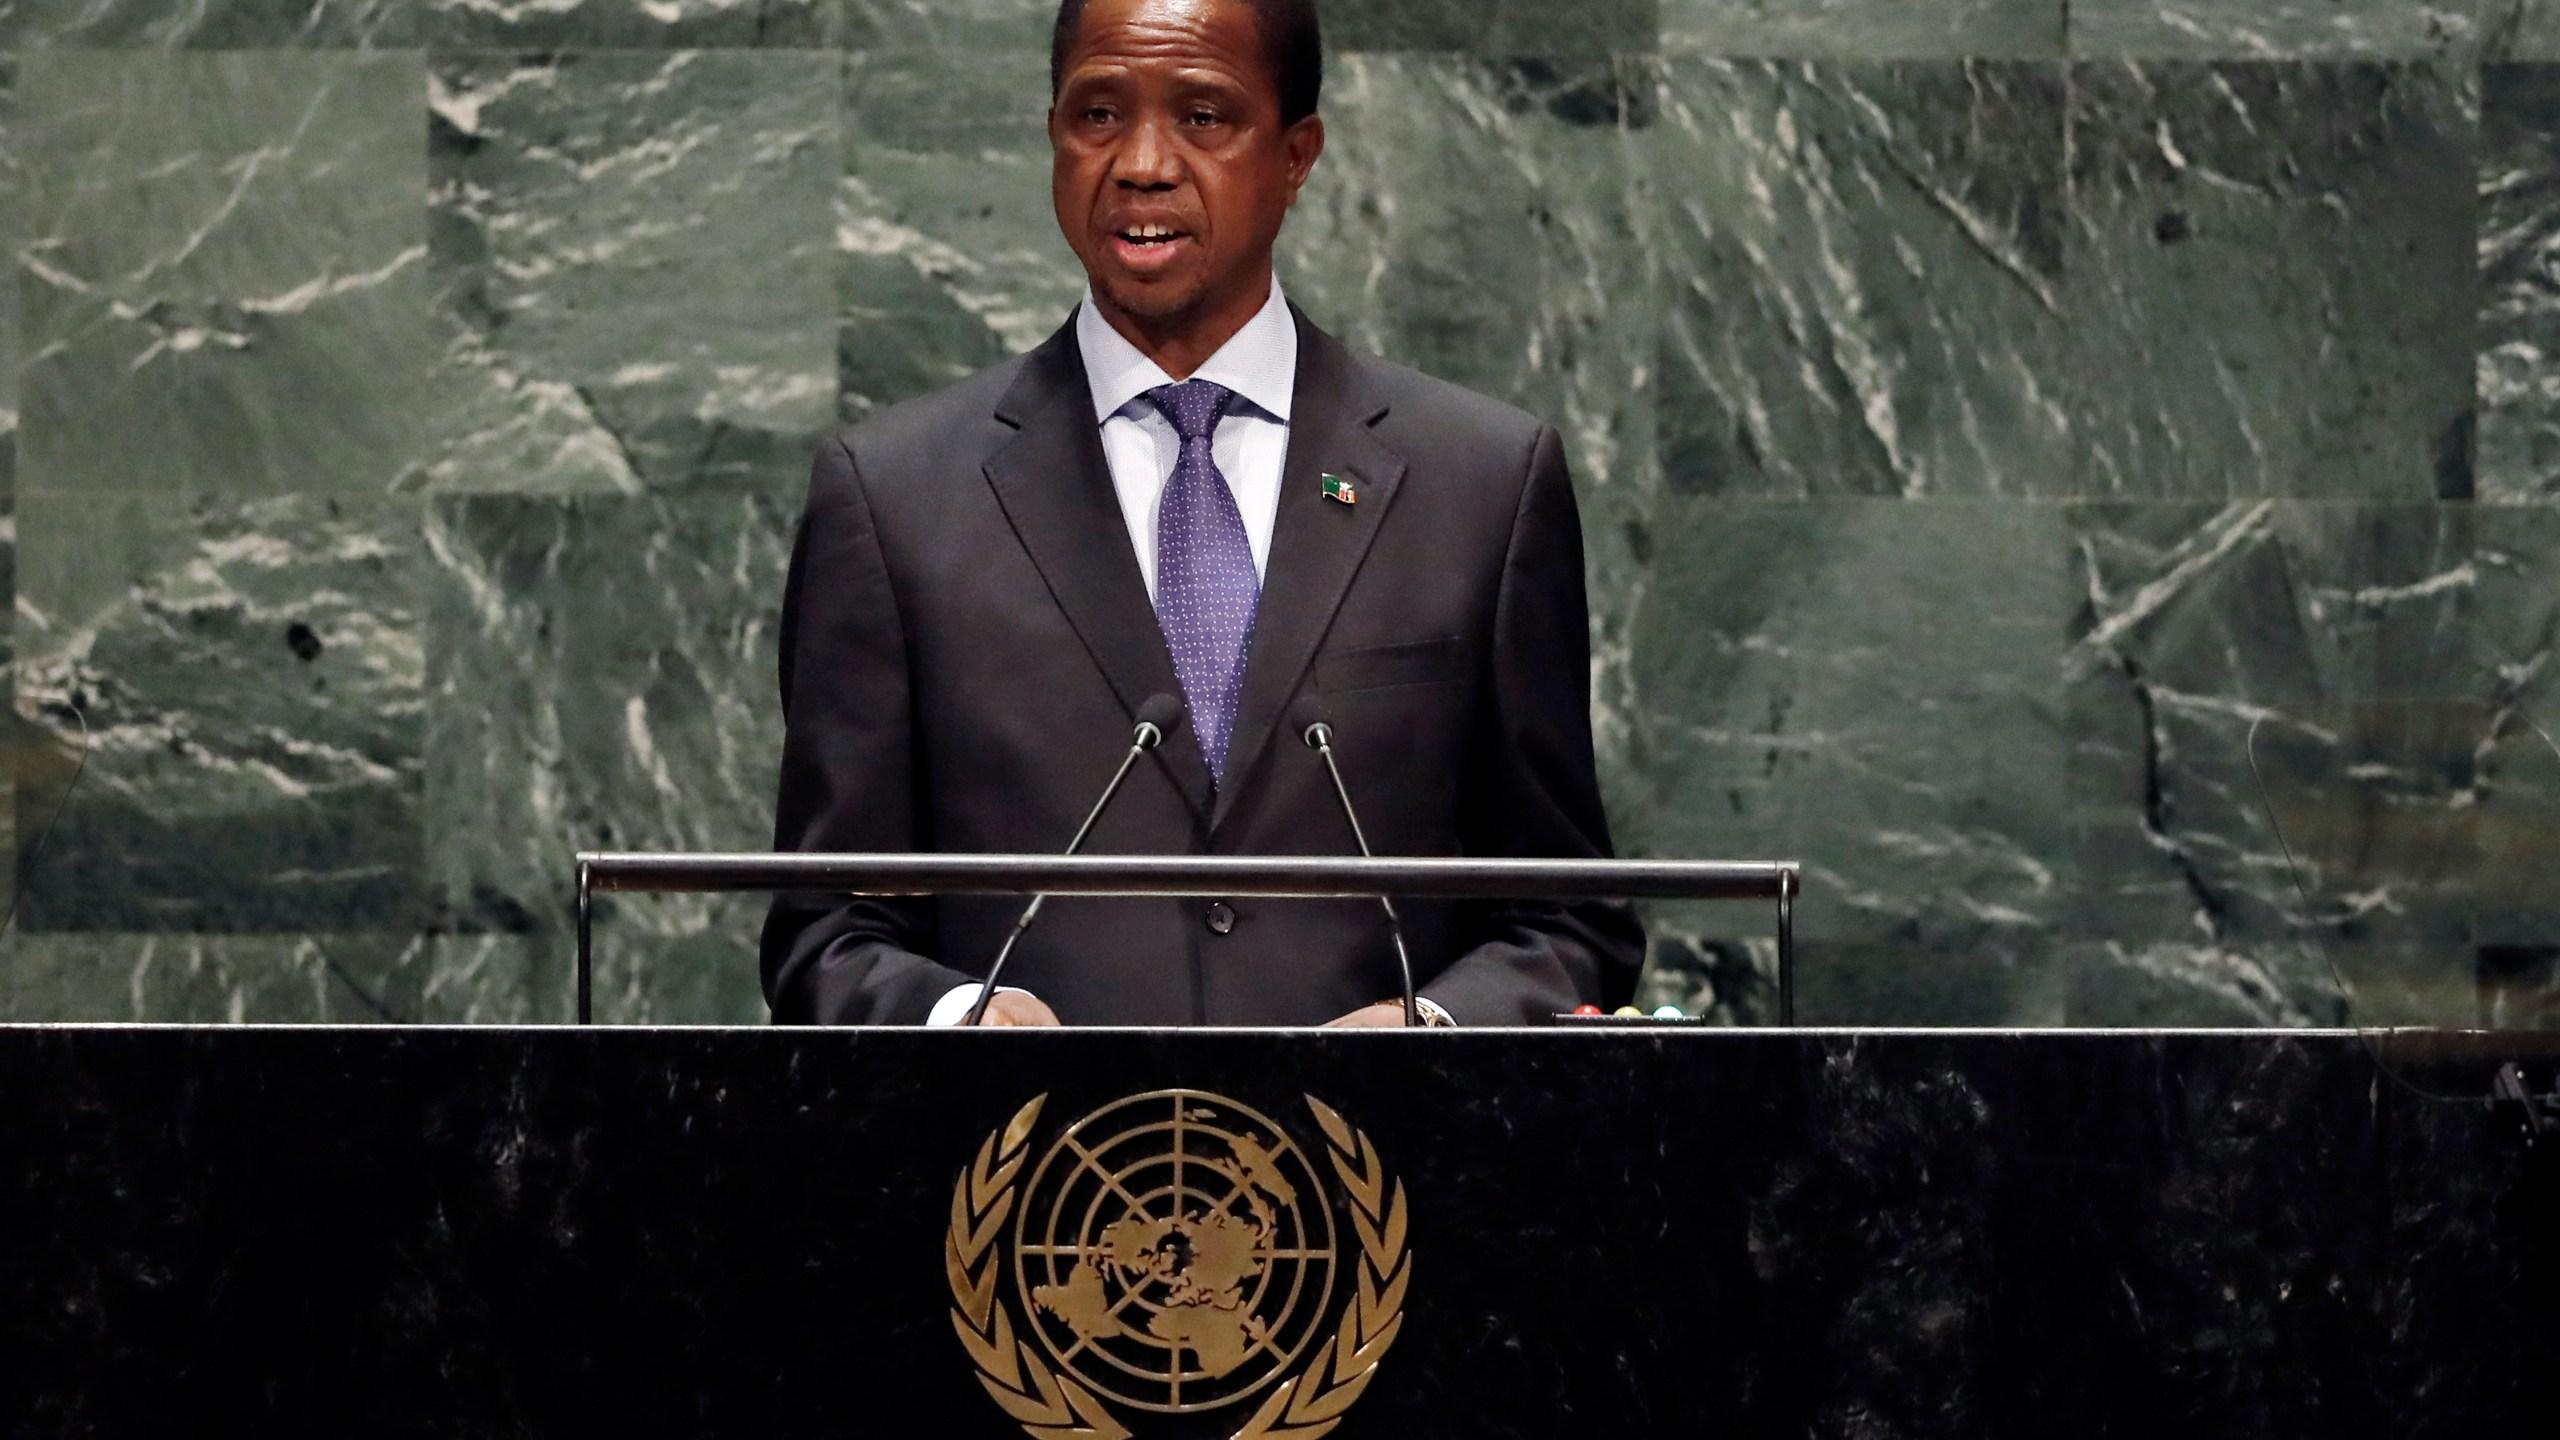 Edgar Chagwa Lungu